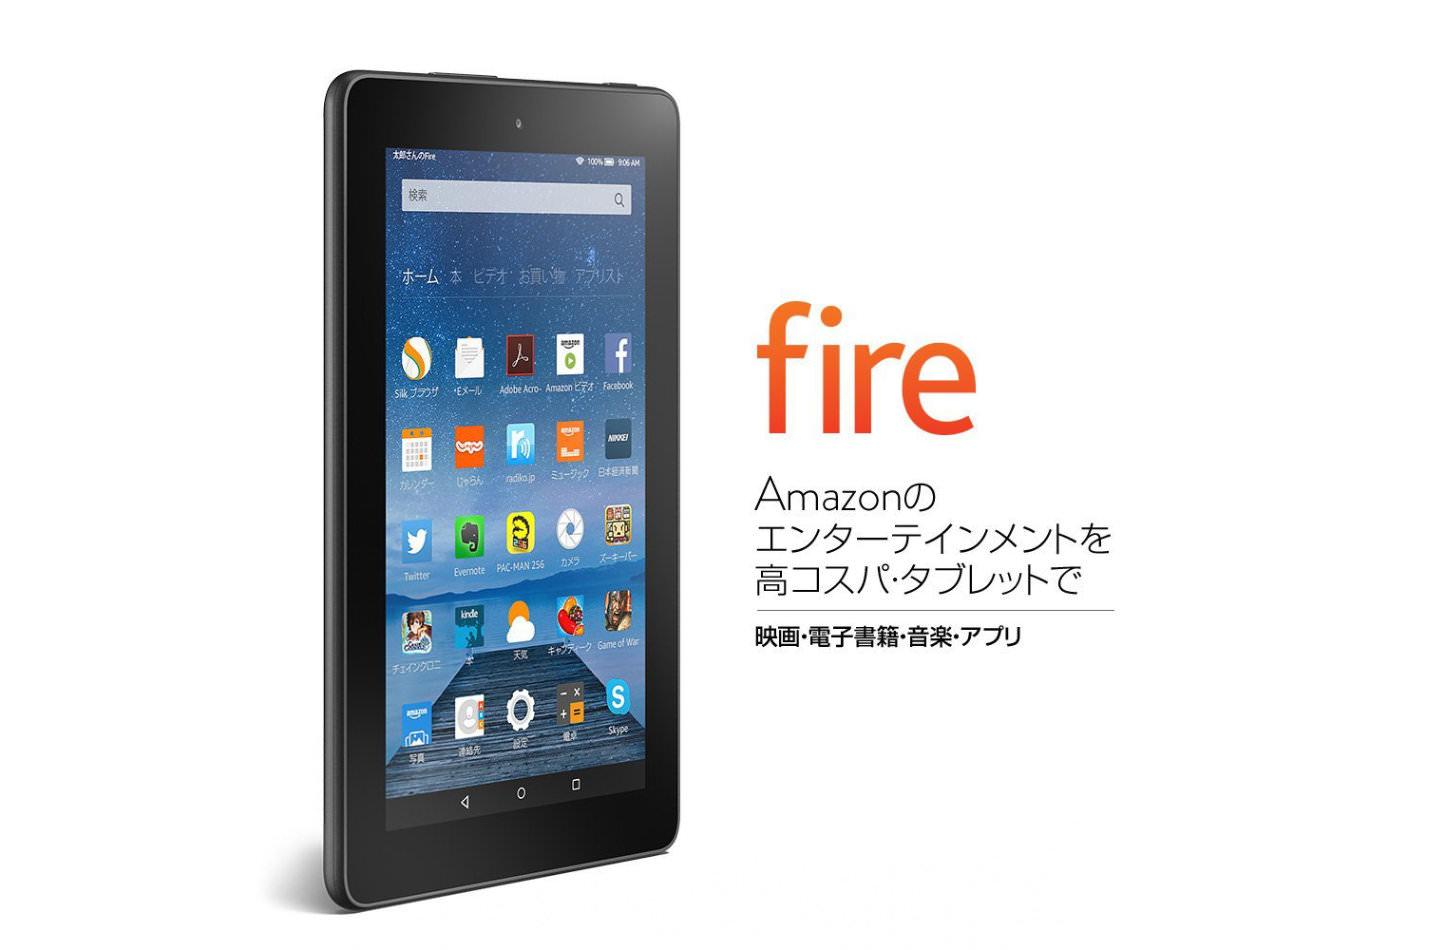 Amazon-Fire-Tablet.jpg